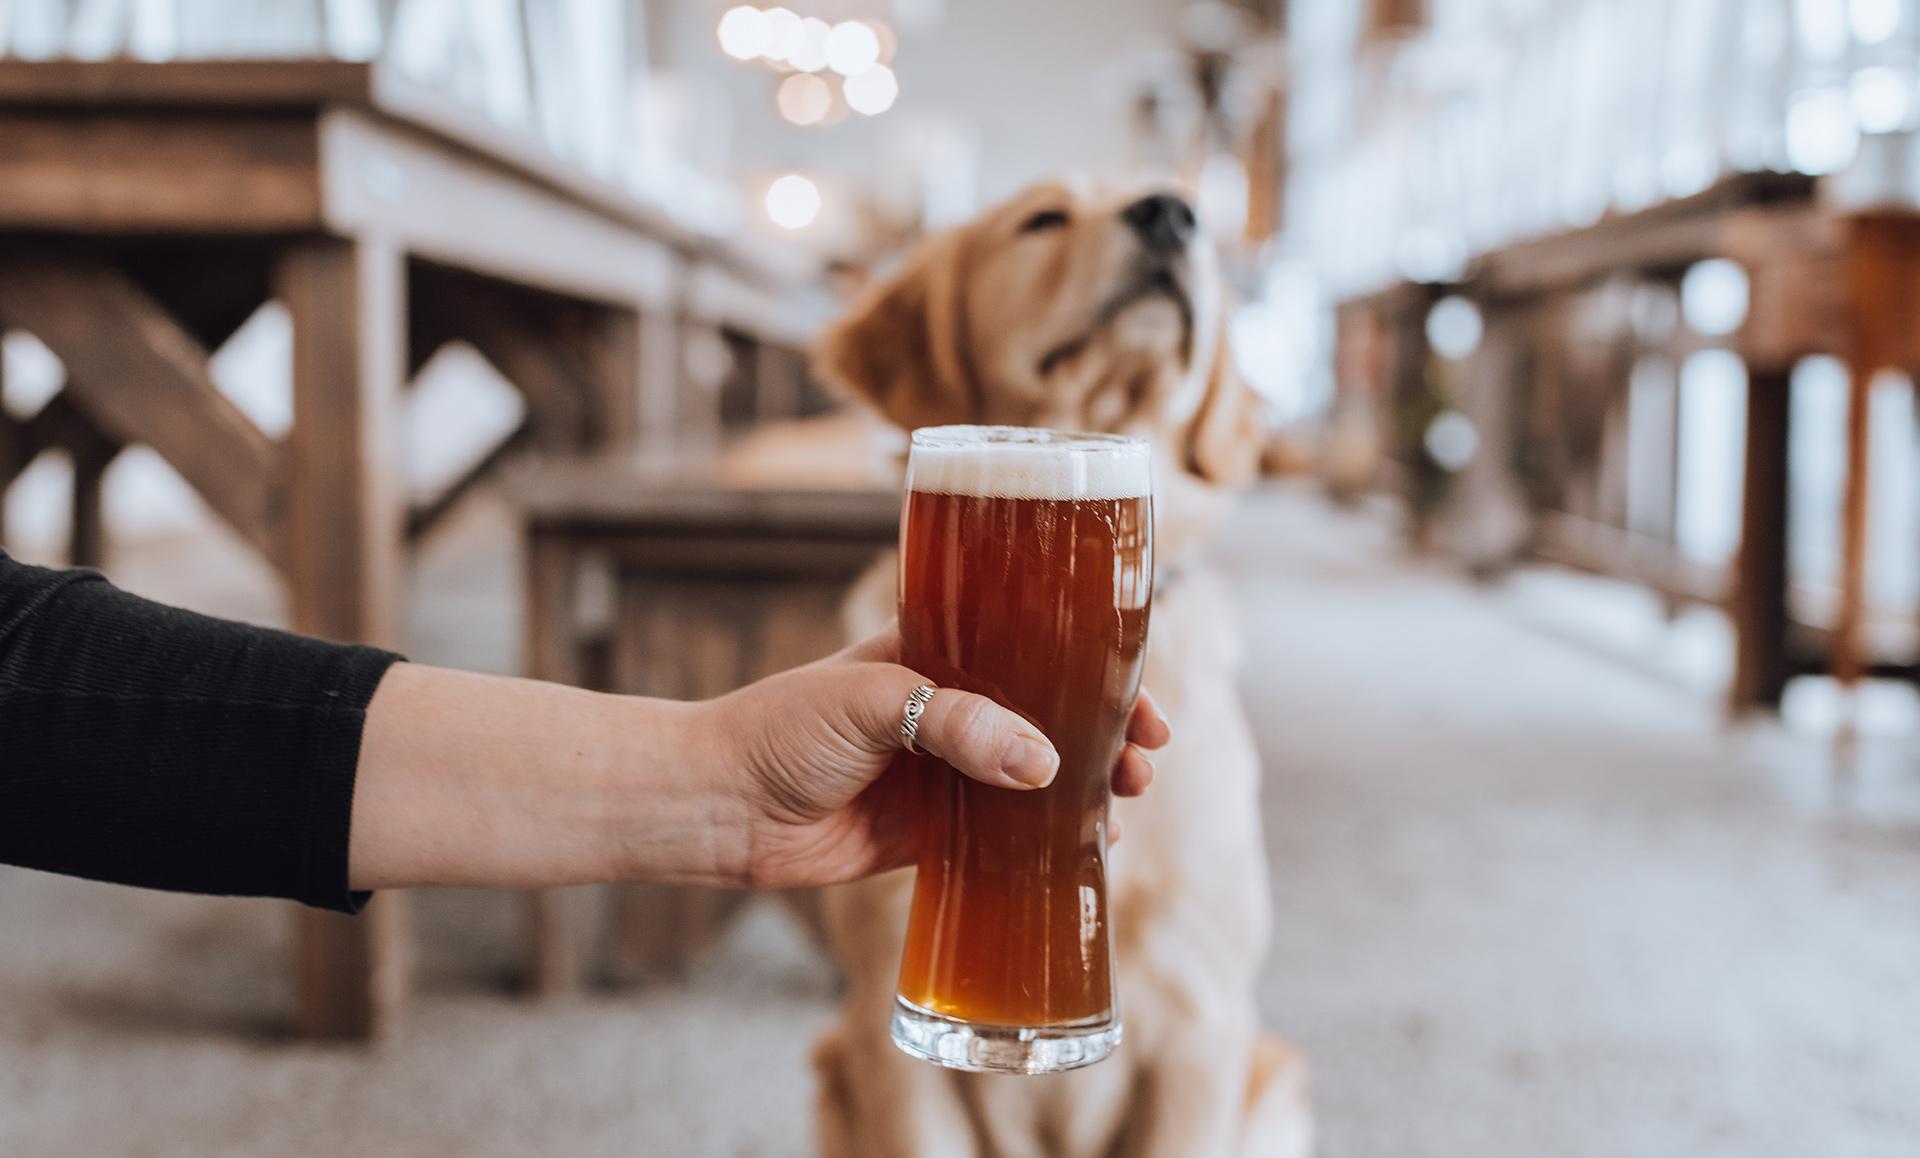 kelowna brewery marketing beer and dog